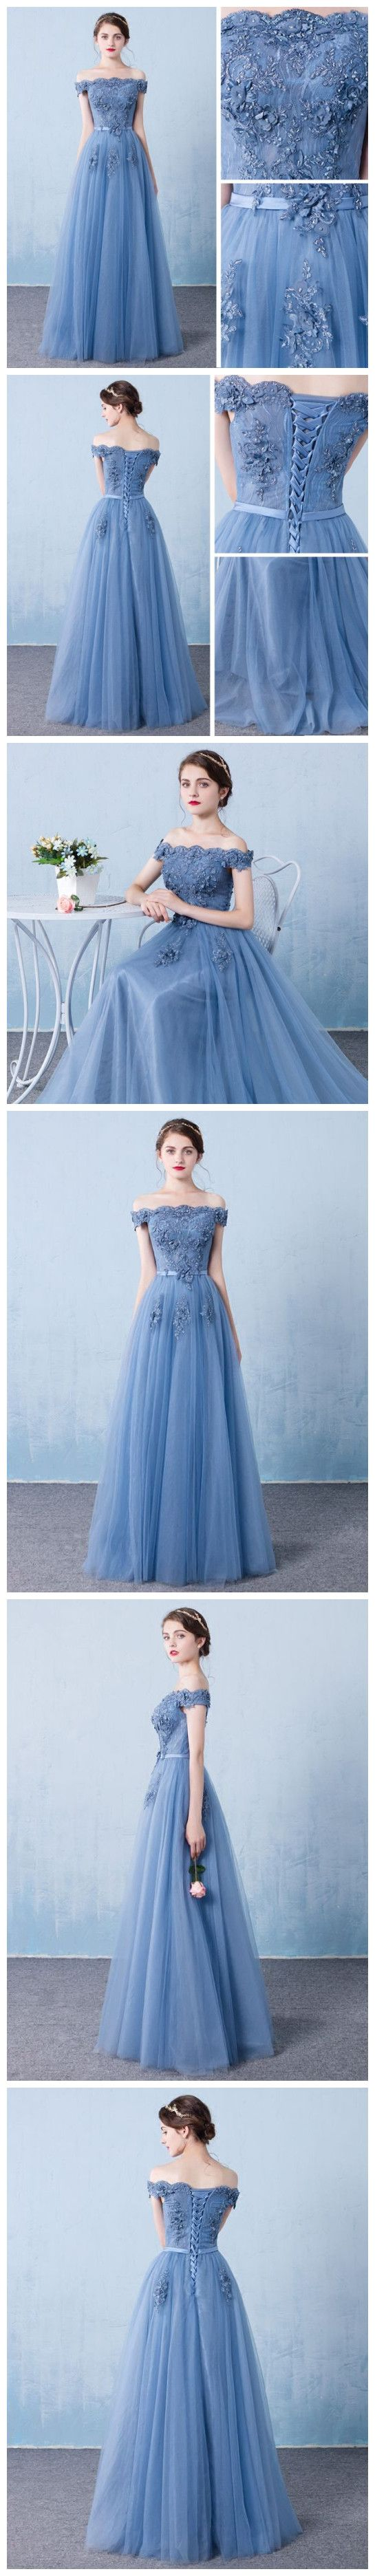 best prom dresses images on pinterest formal dresses high